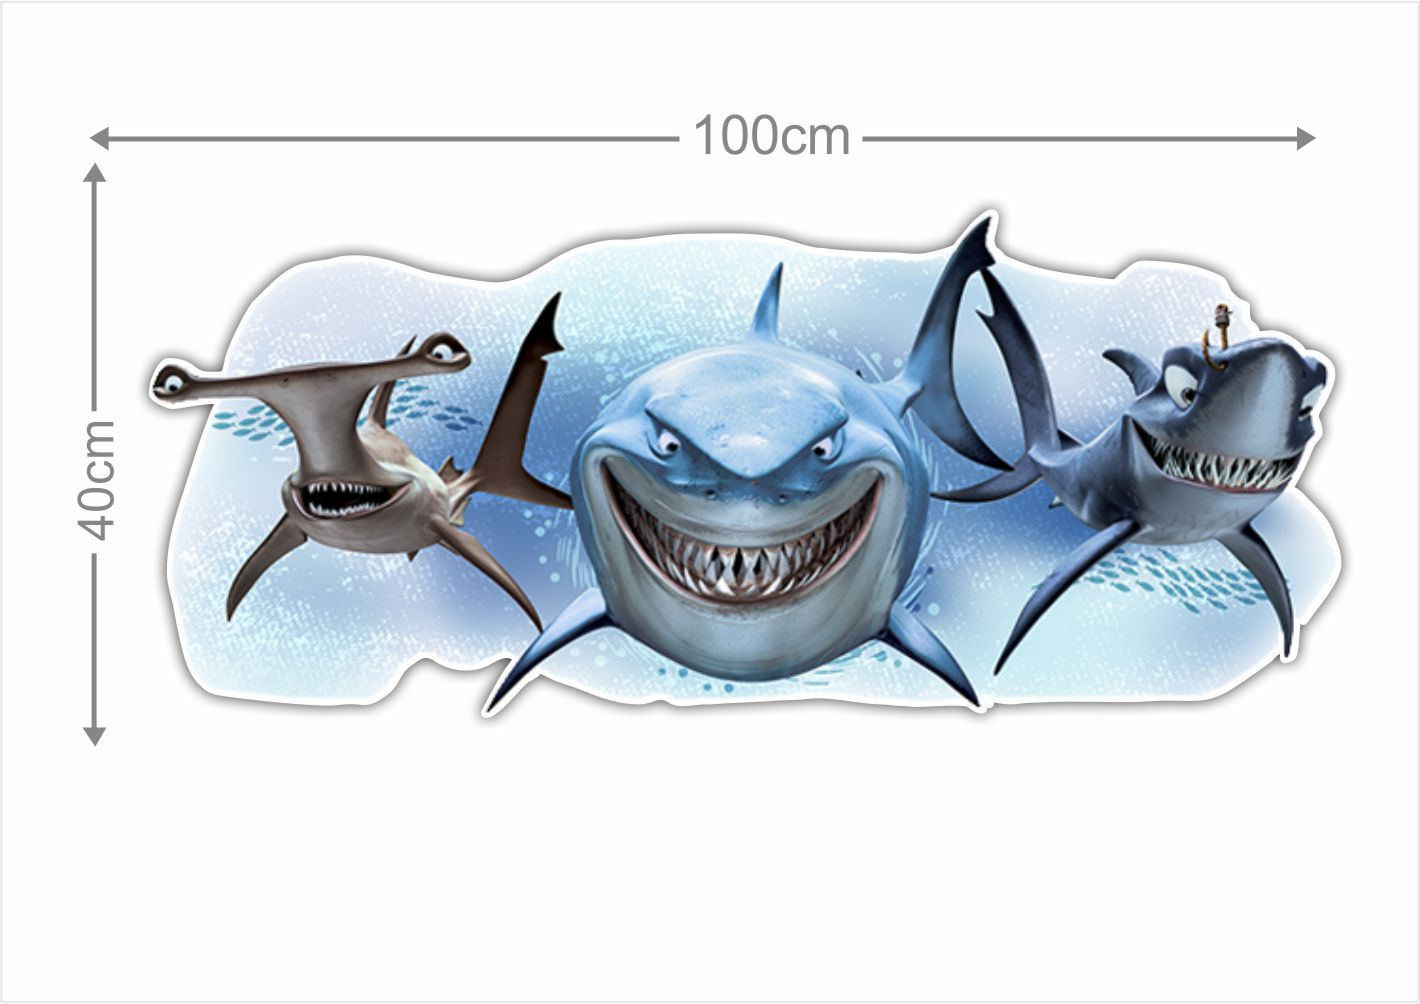 Adesivo Decorativo Nemo 0013  - Paredes Decoradas